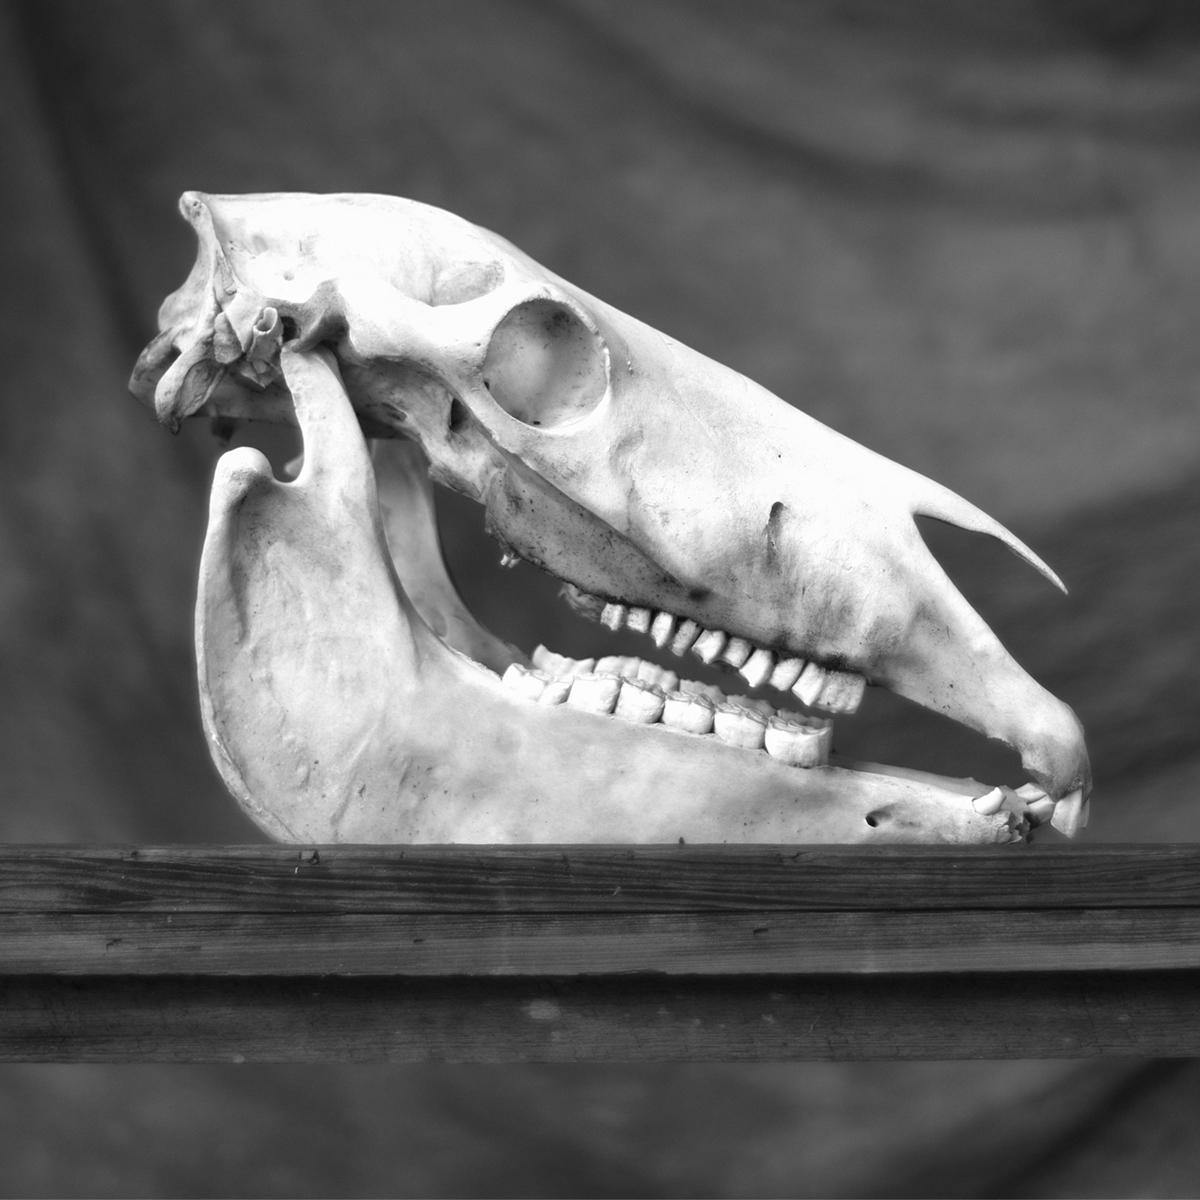 Skull of a Horse, Cumberland Island, 2018 © Anne Berry